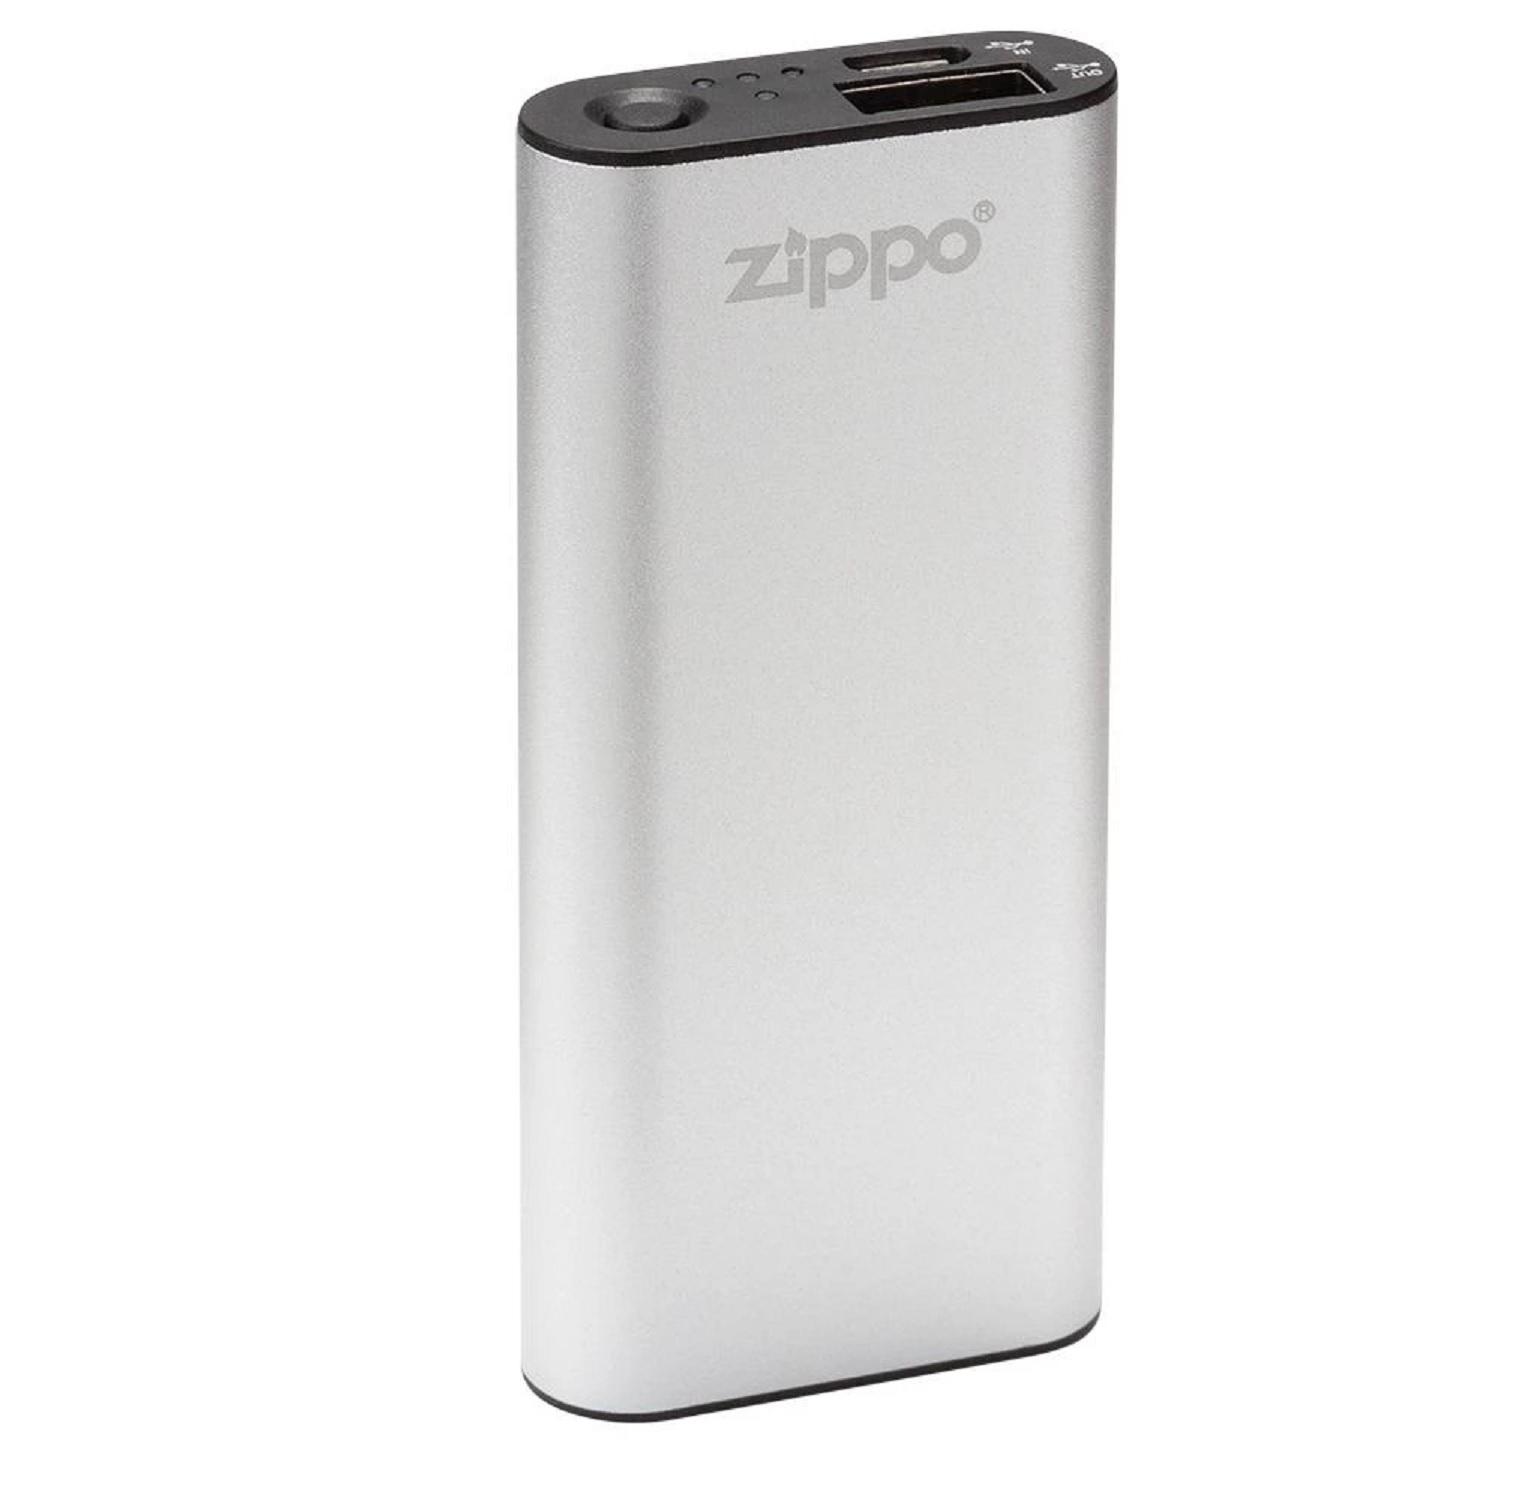 Zippo Silver HeatBank 3 Rechargeable Hand Warmer